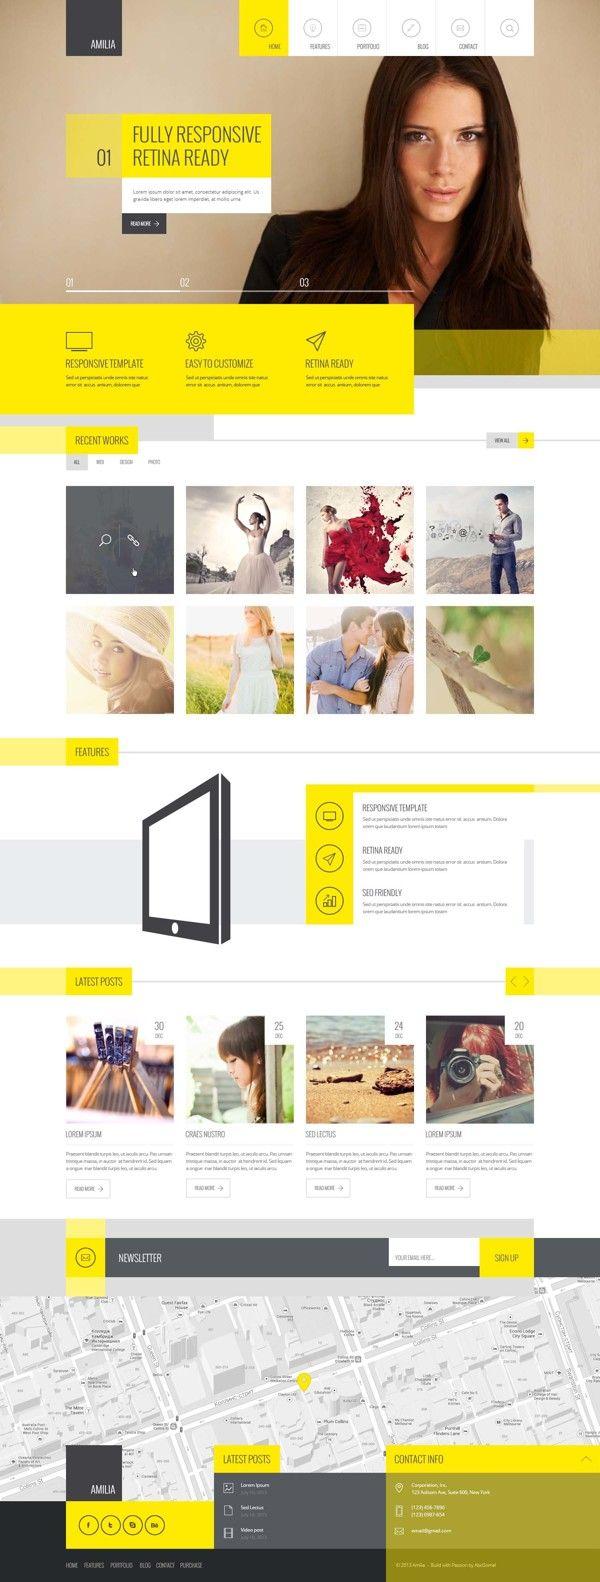 #responsive #design #webdesign #inspiration